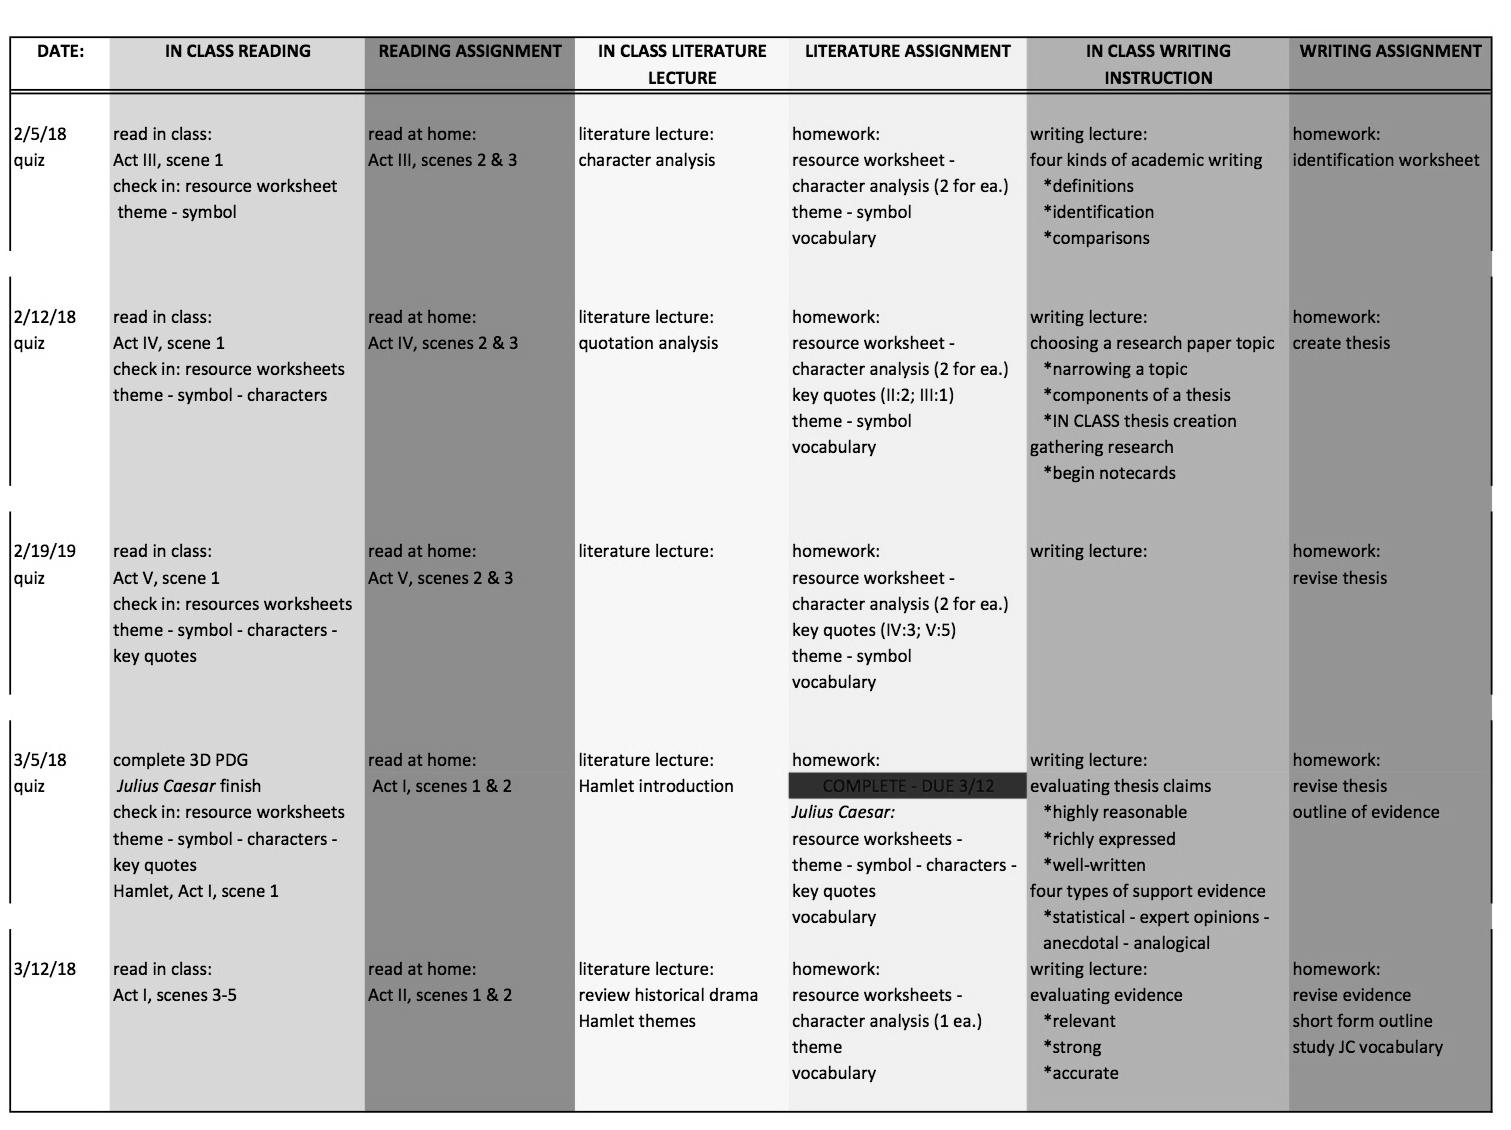 201718 Revised Writing Class Spring Semester Syllabus (version 1) Sheet1.jpg